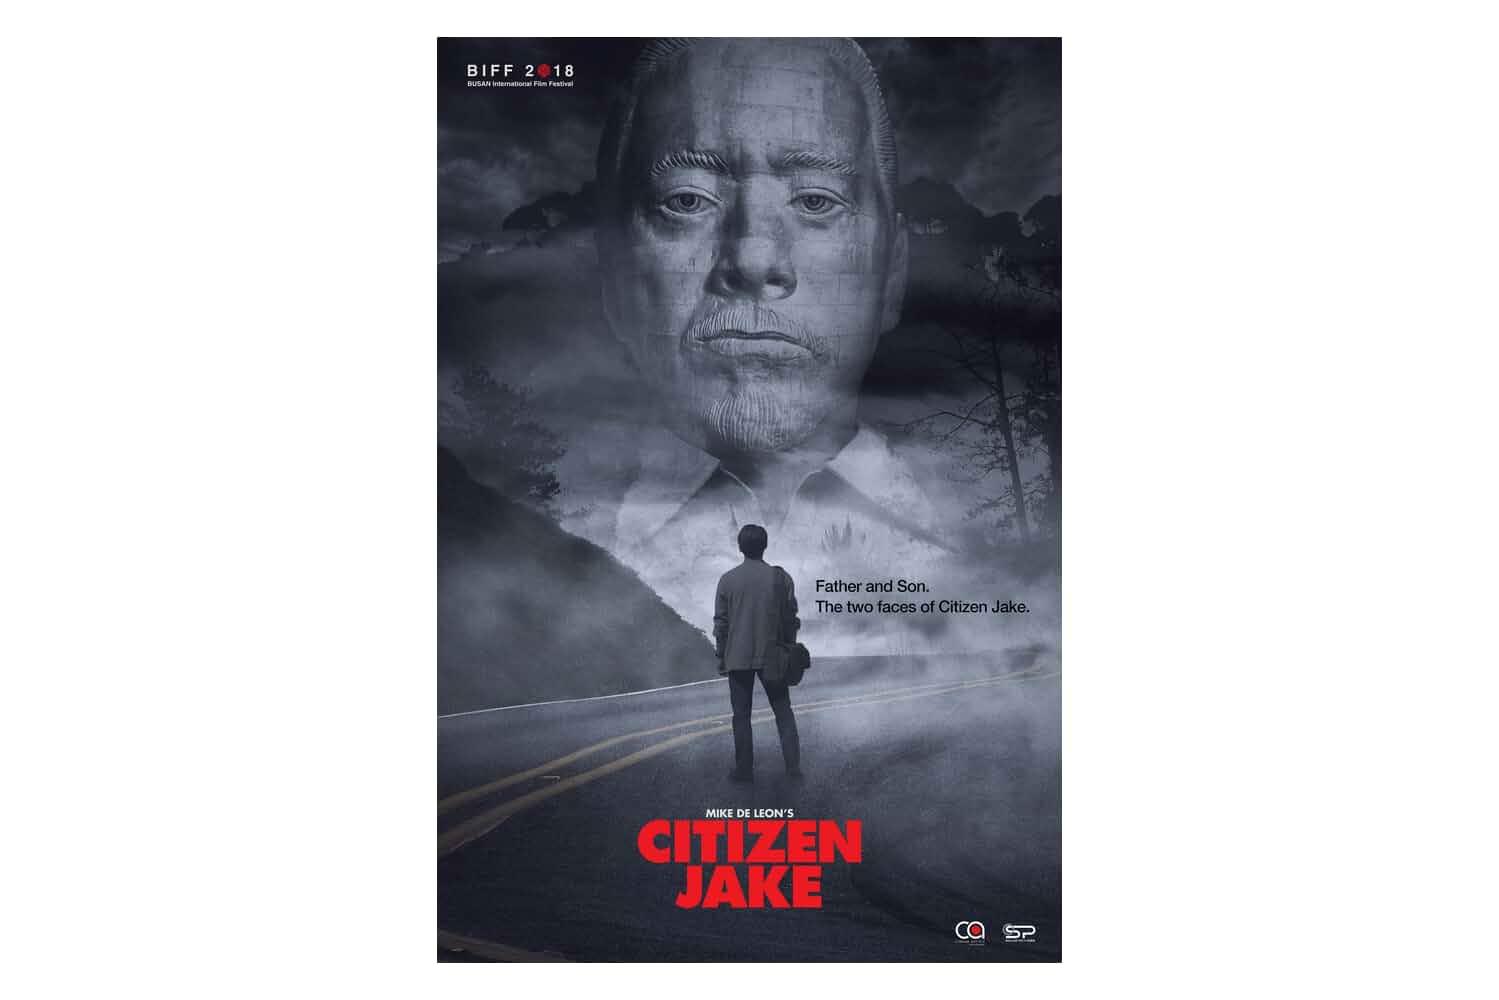 Citizen Jake (2018)